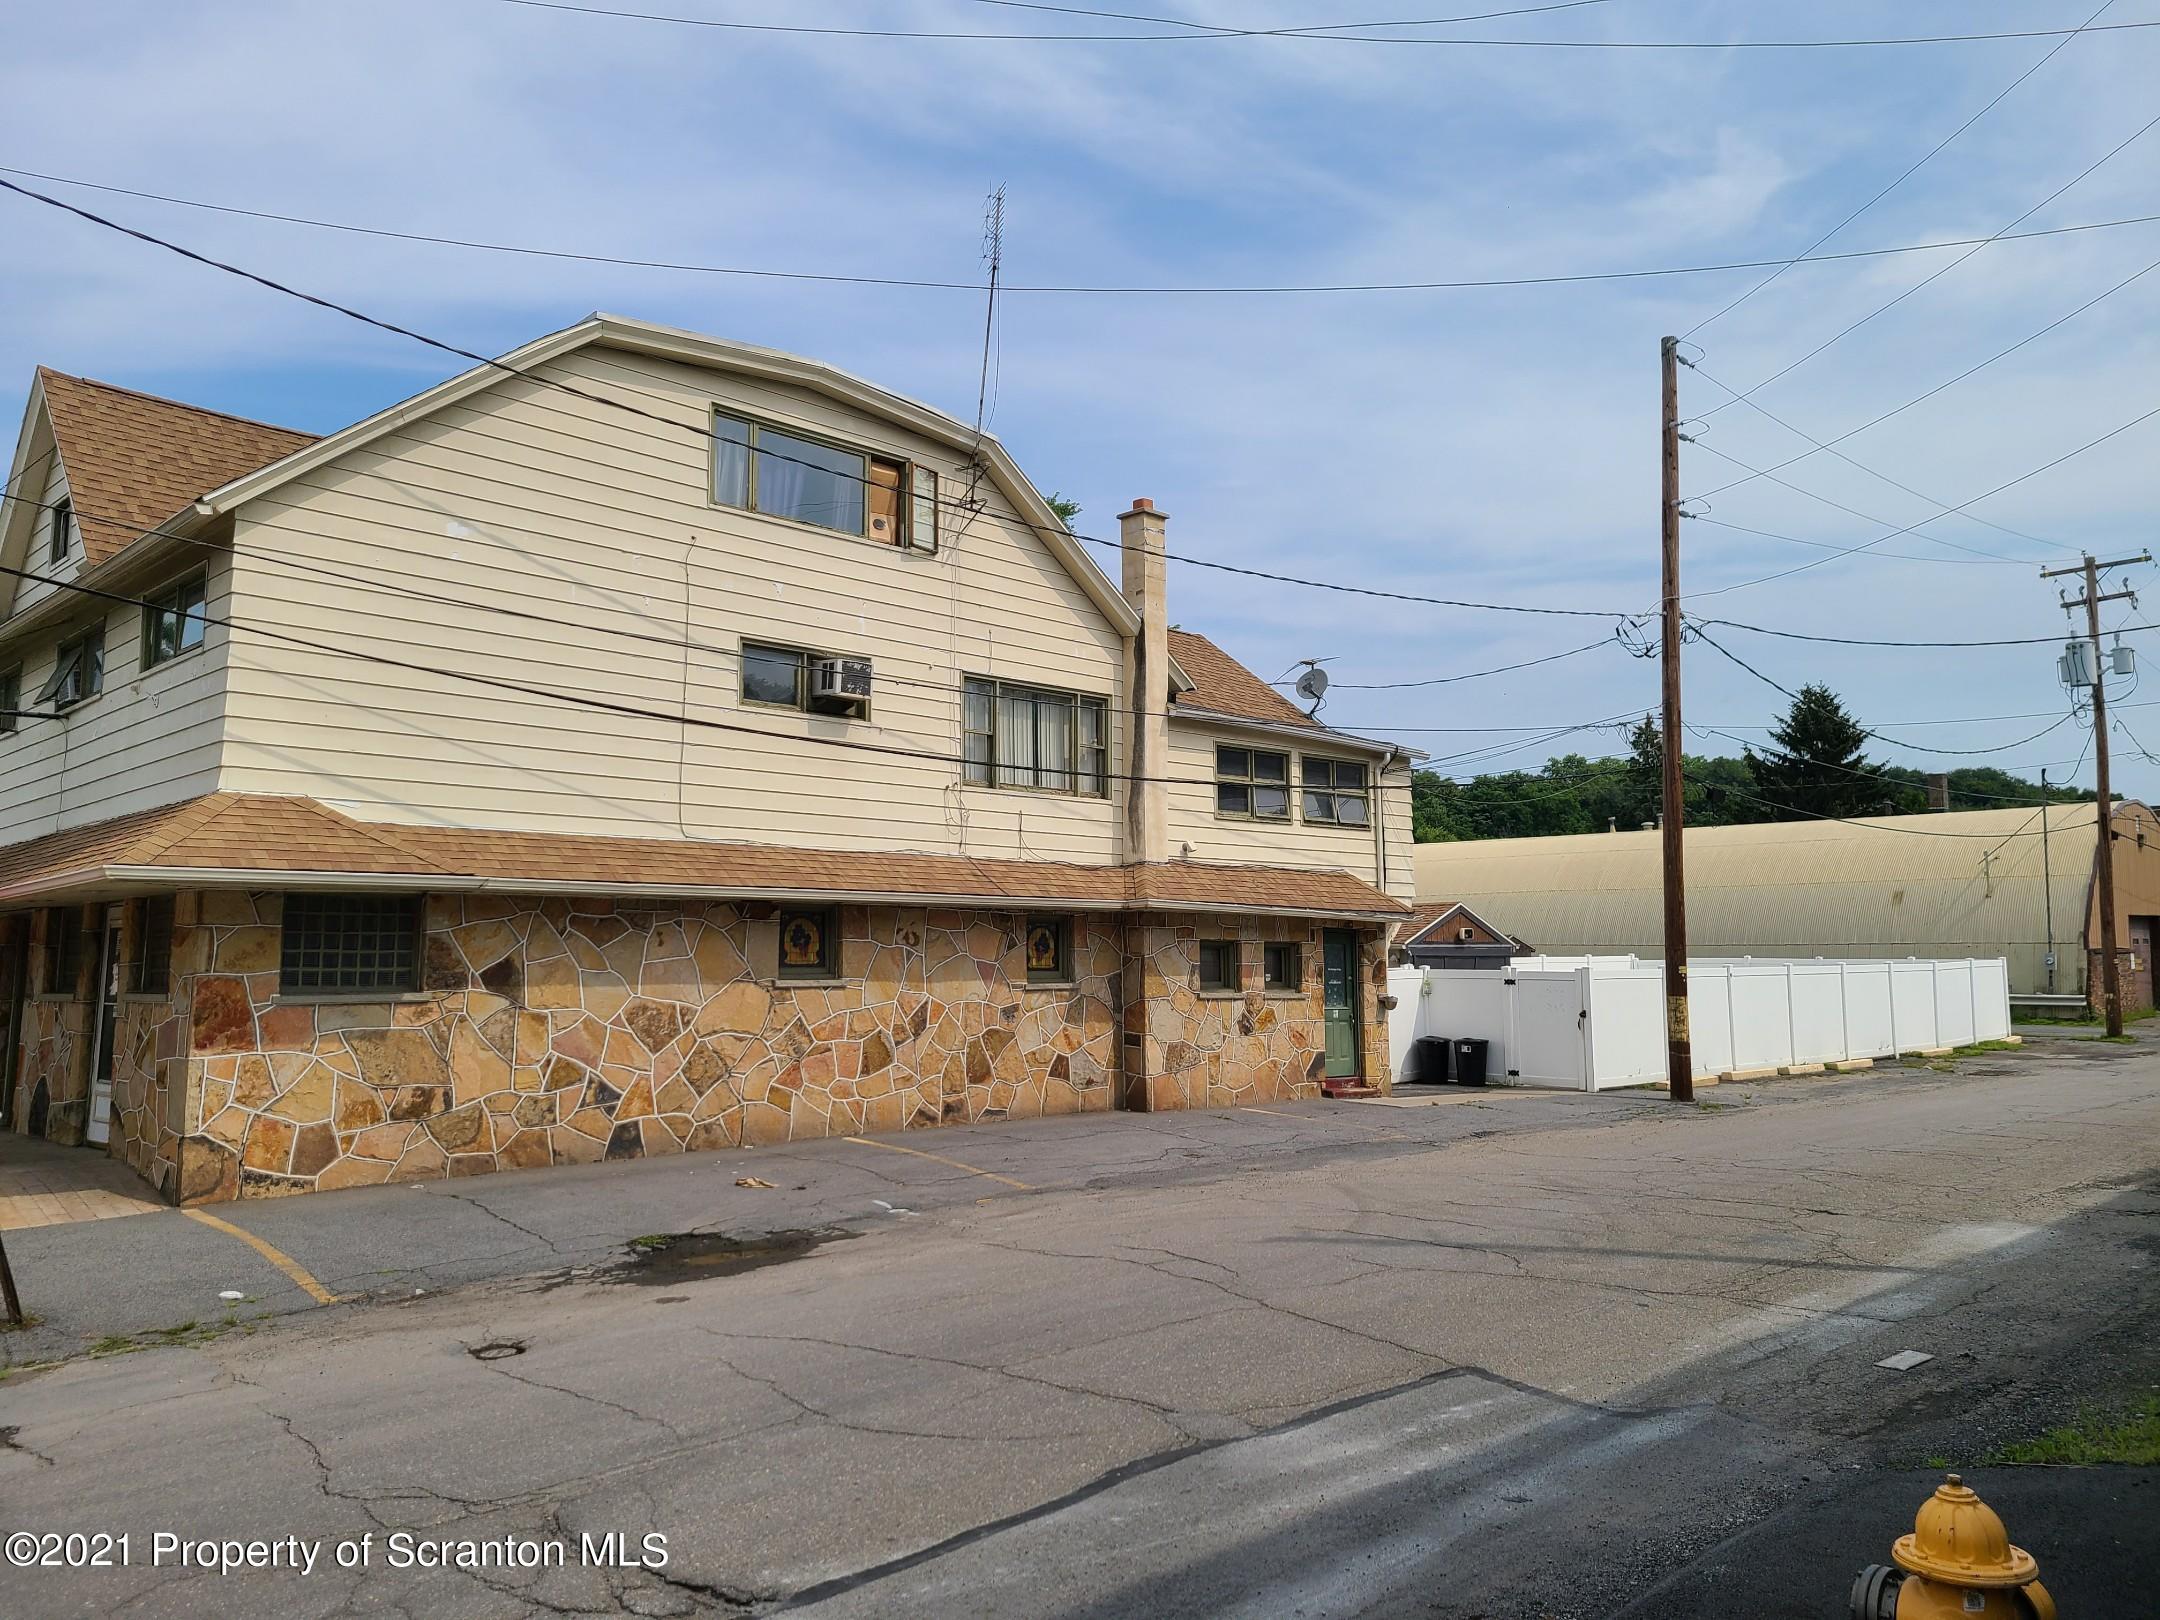 217-219 Market St, Scranton, Pennsylvania 18509, ,2 BathroomsBathrooms,Commercial,For Sale,Market,21-3189